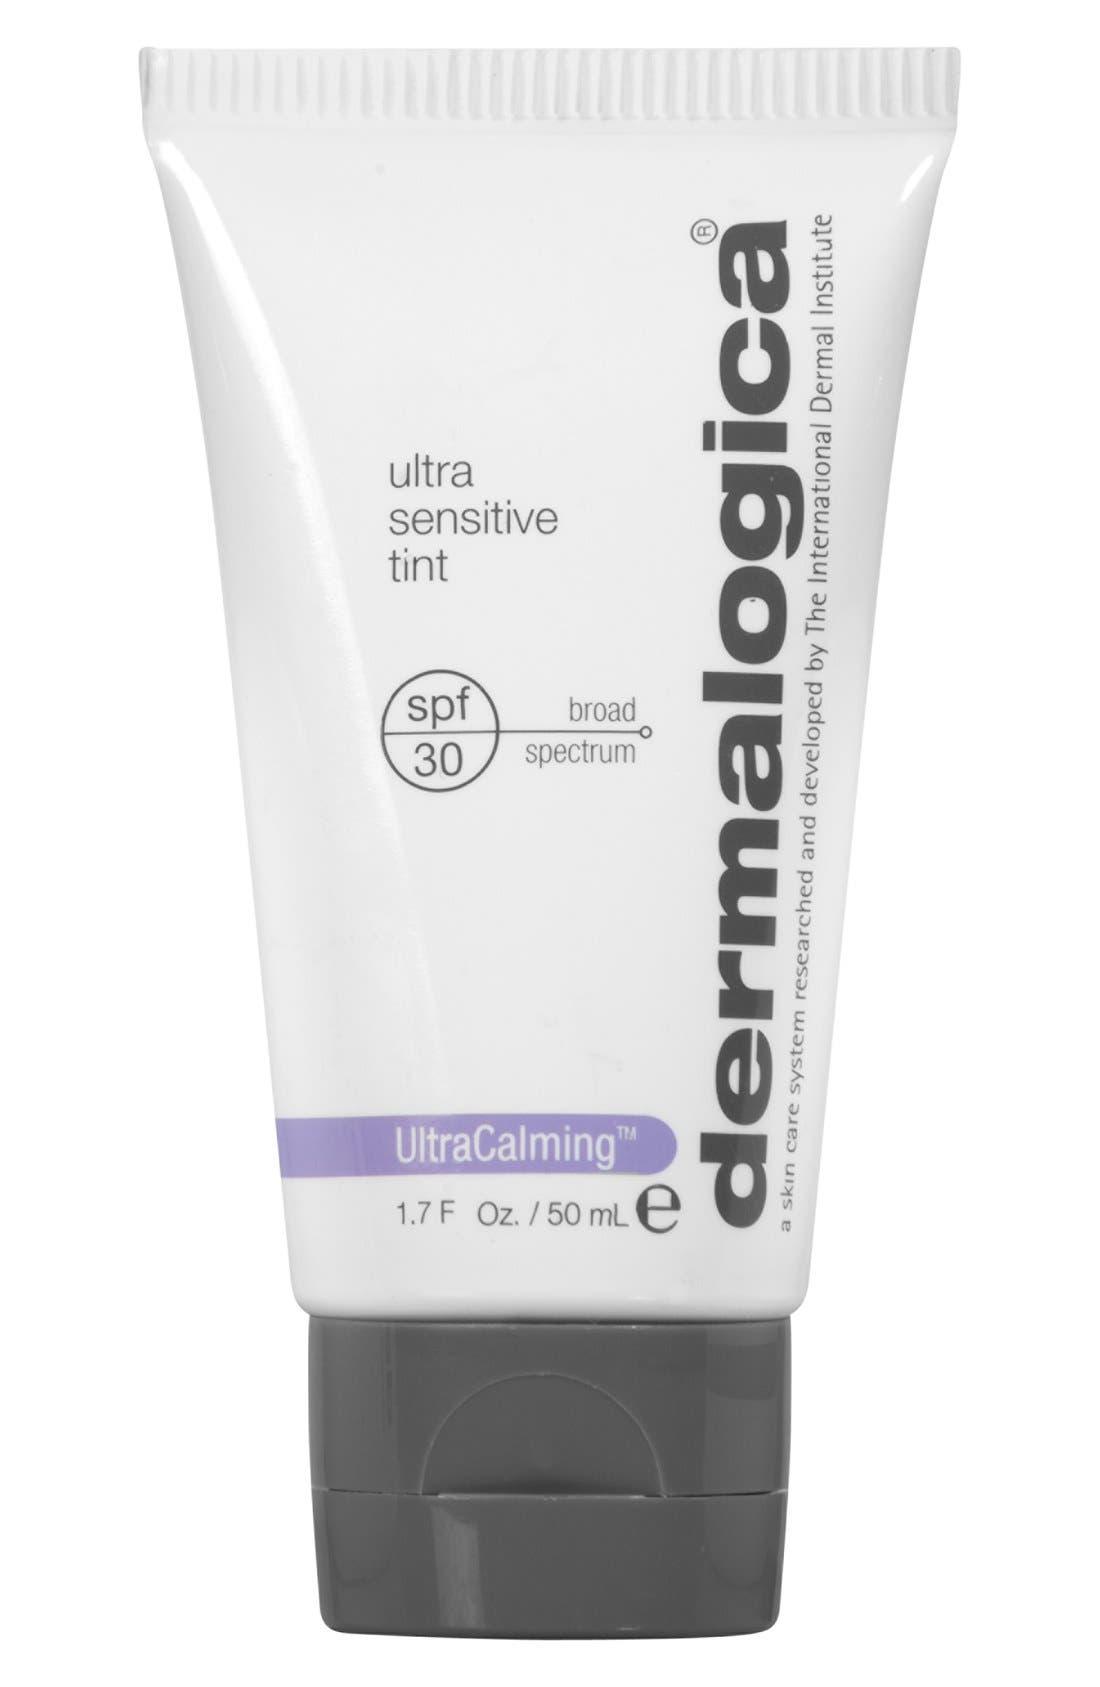 dermalogica® Ultra Sensitive Tint SPF 30